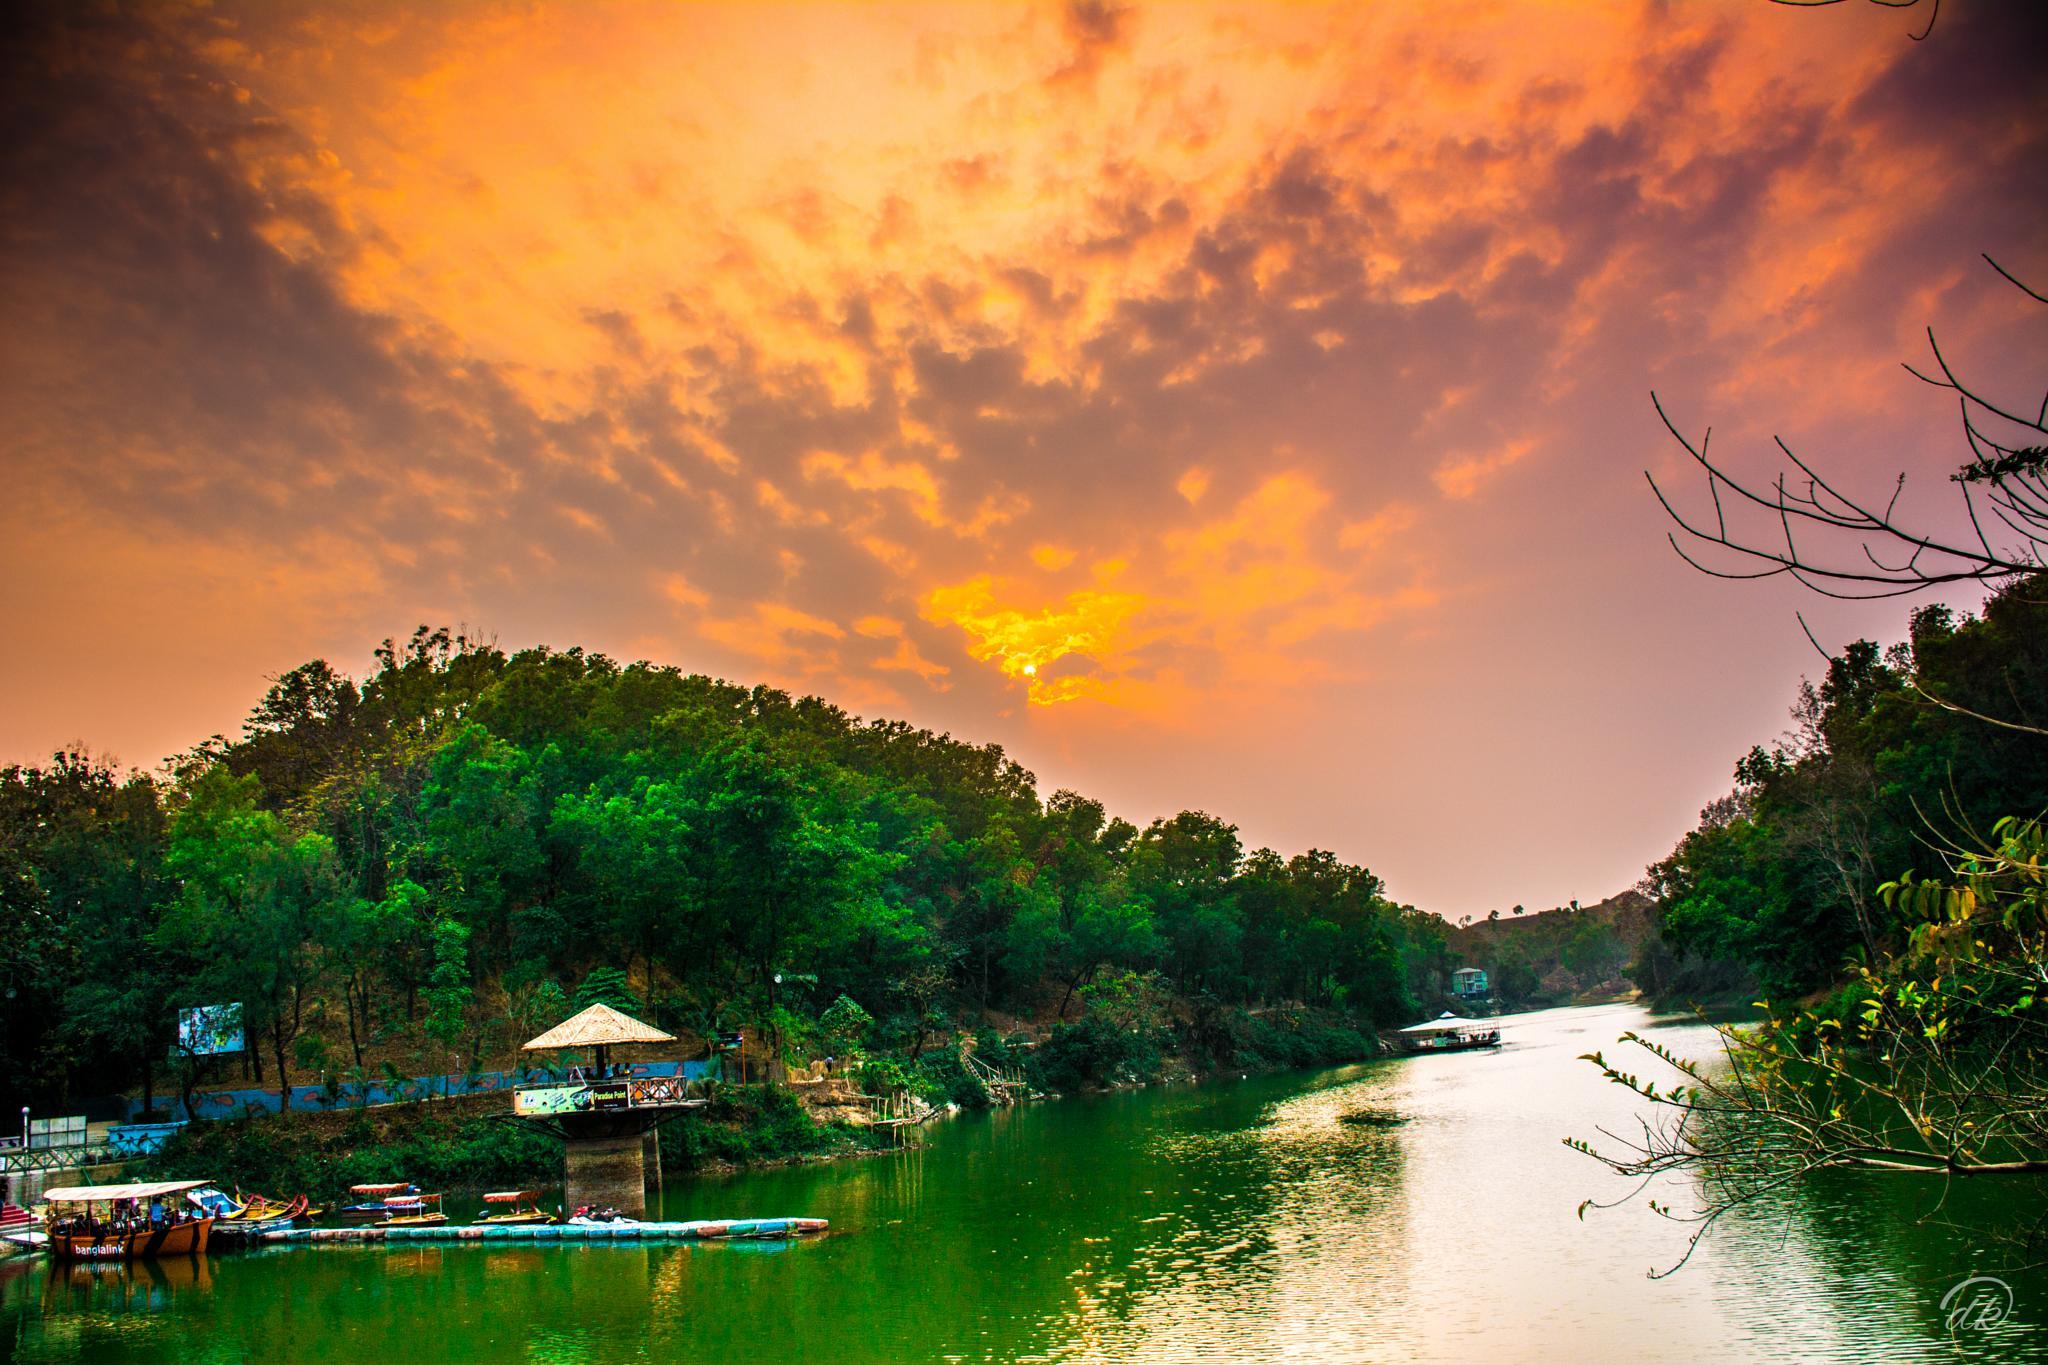 Foy's Lake by dk snap